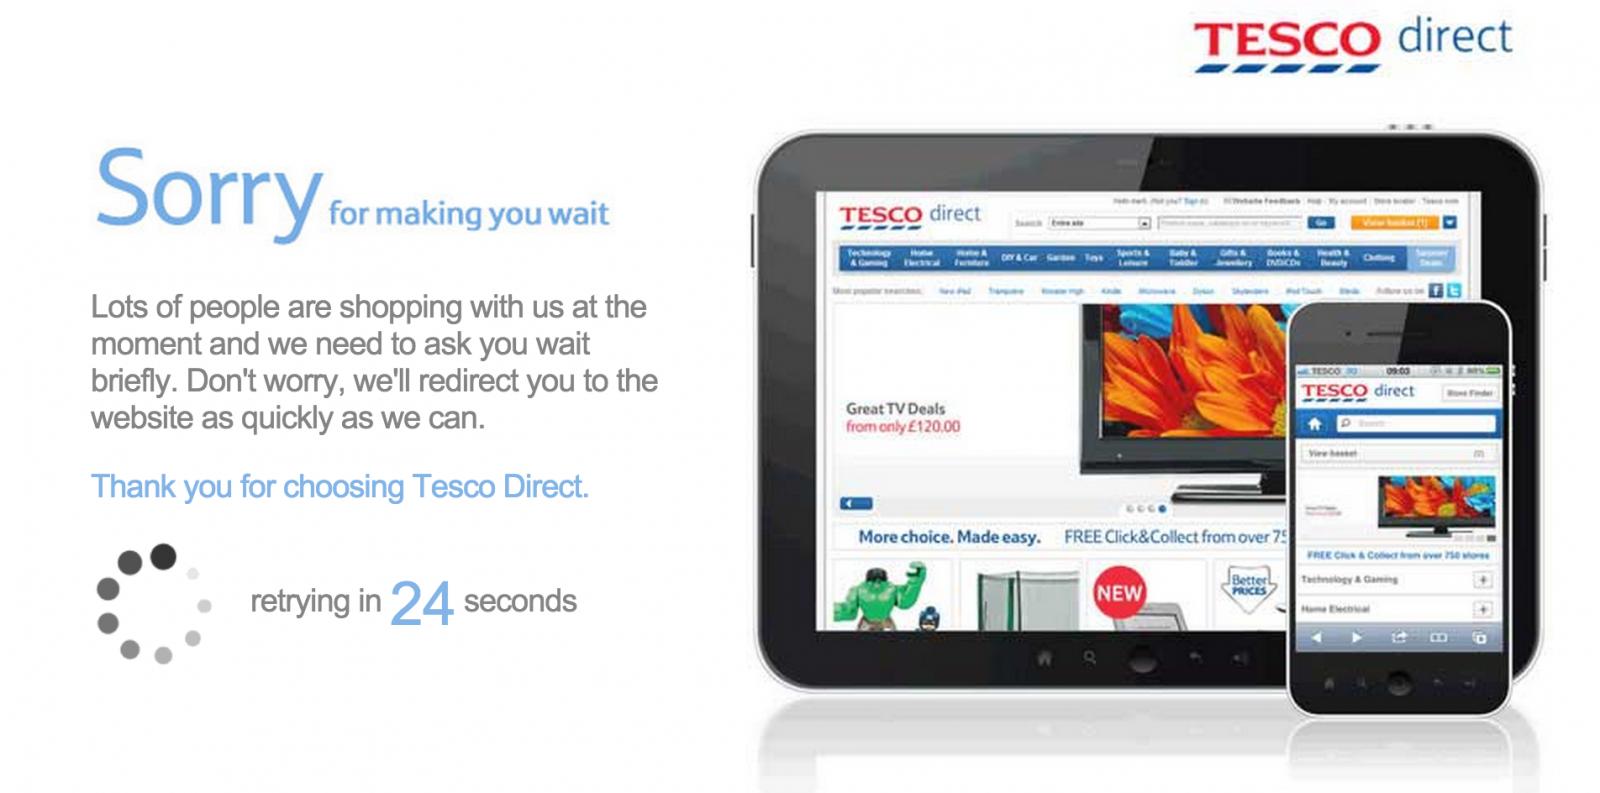 Tesco Black Friday Deals Website Offline